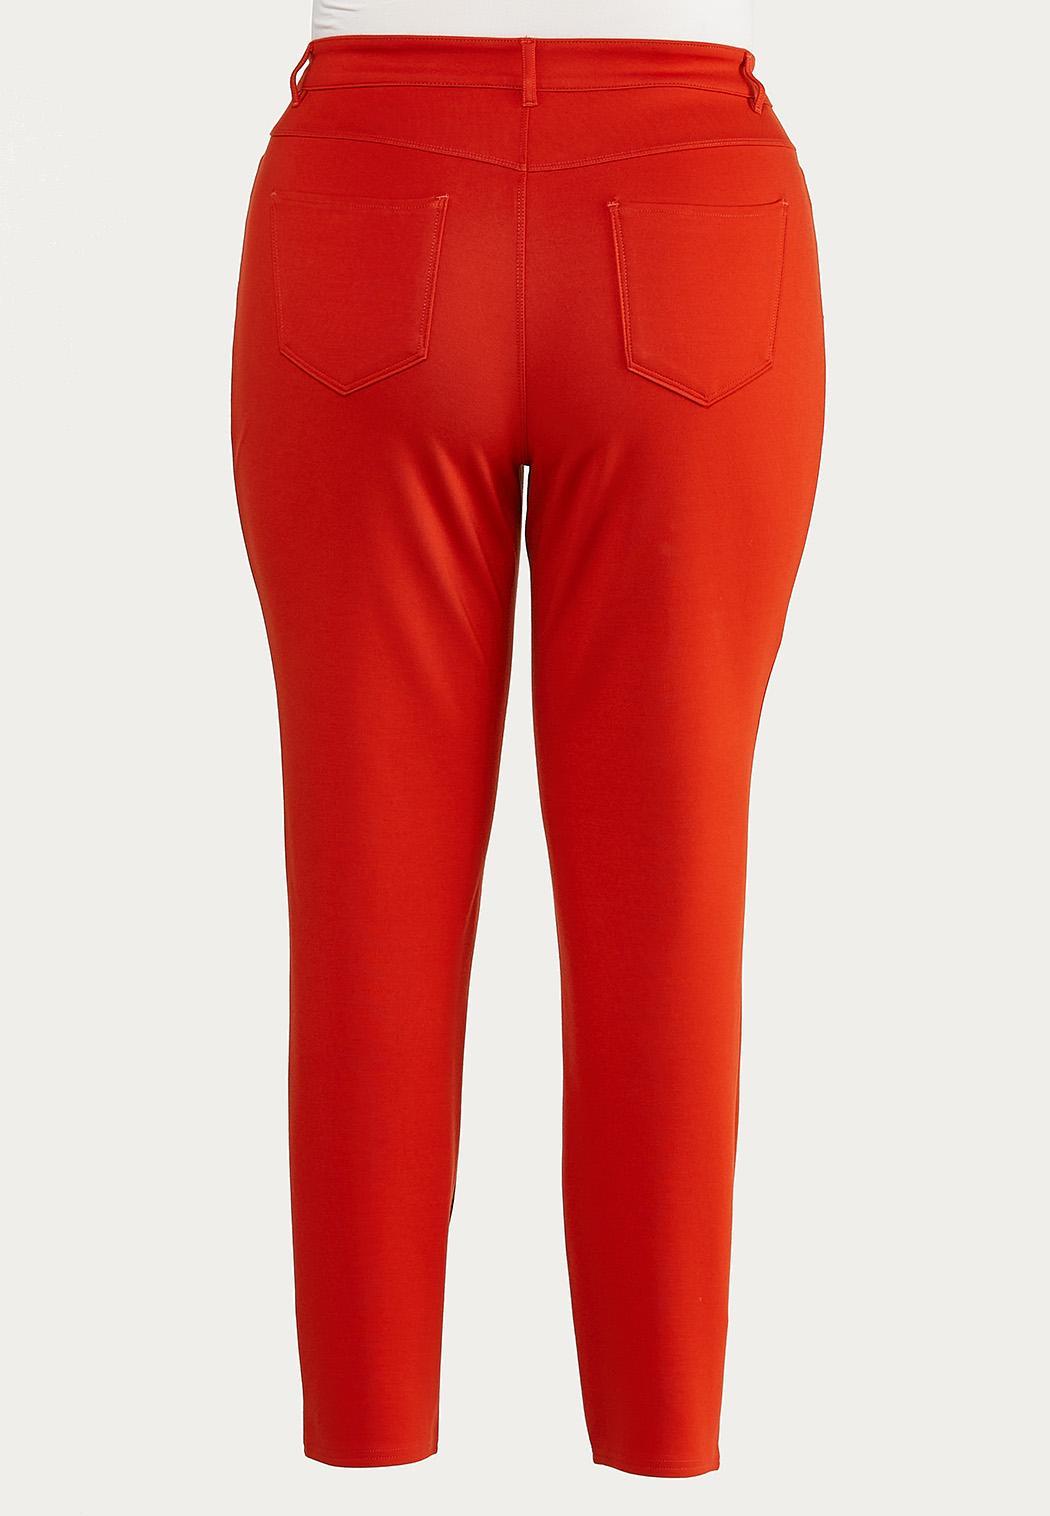 Plus Size Skinny 5-Pocket Ponte Pants (Item #44546590)